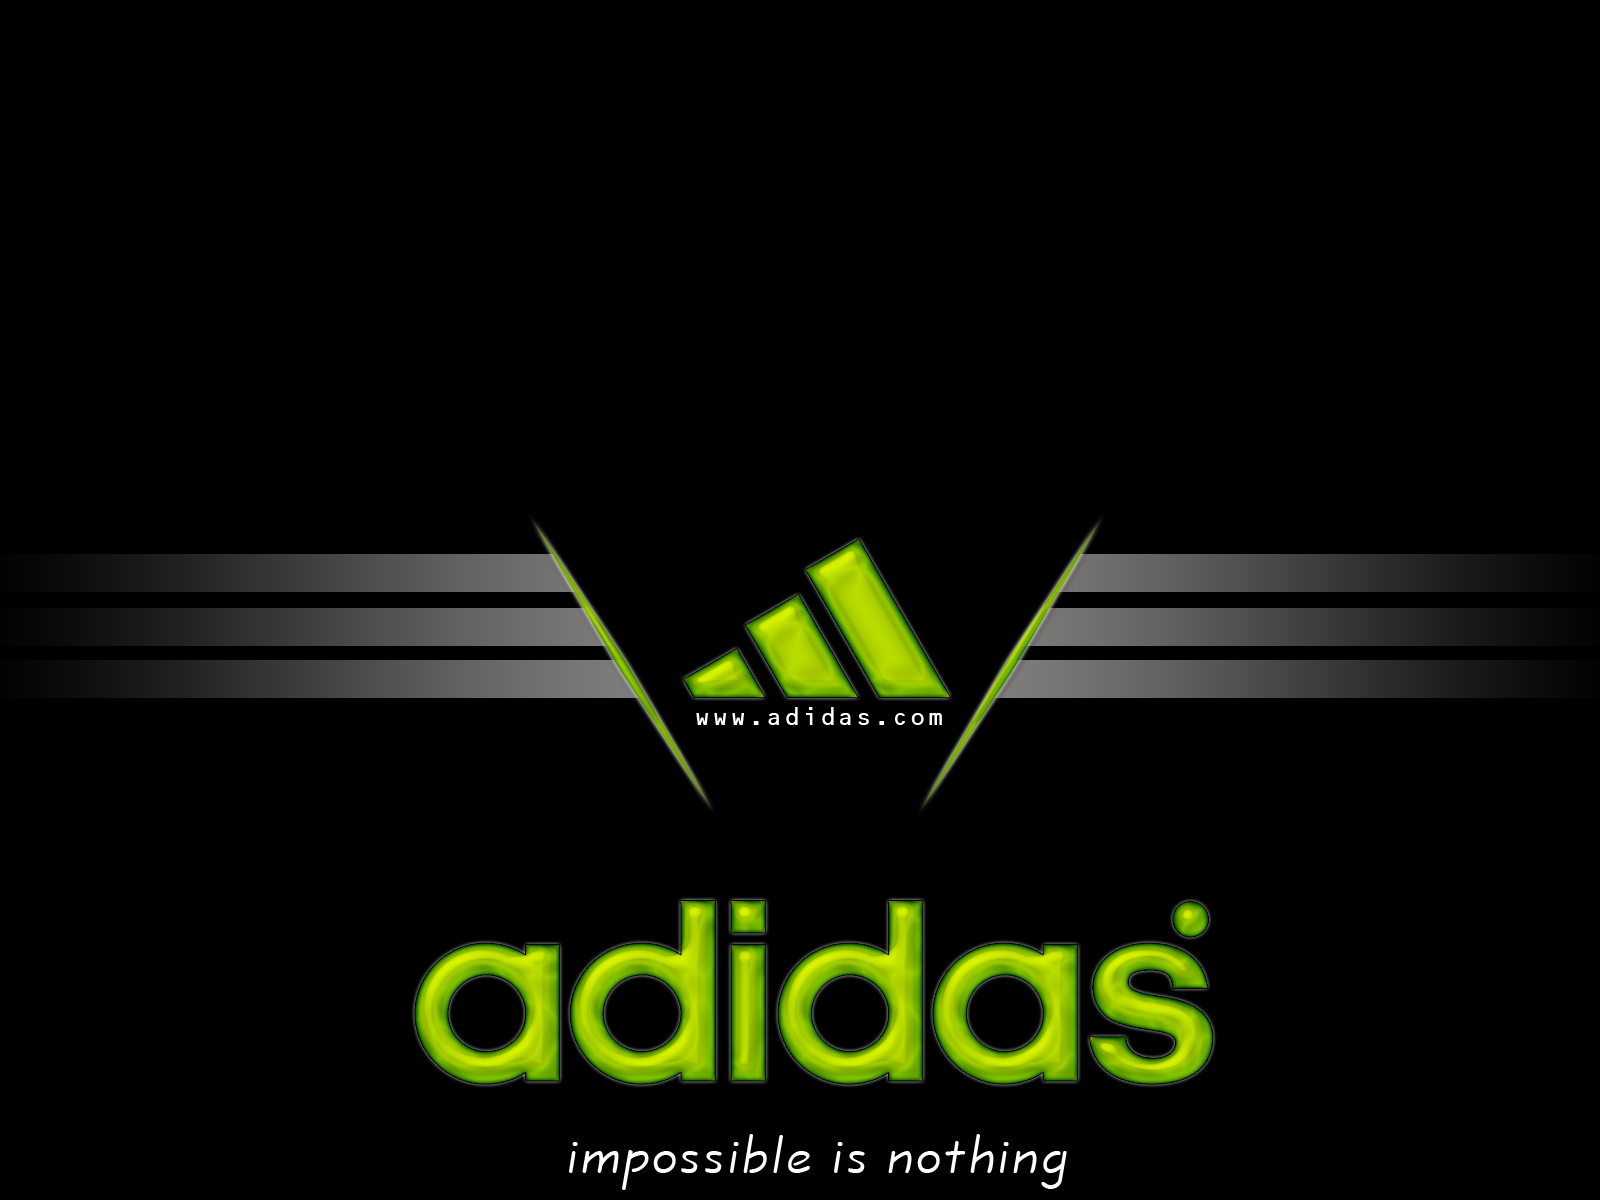 canal Dictadura Te mejorarás  21+] Adidas Logo 3D Wallpaper on WallpaperSafari